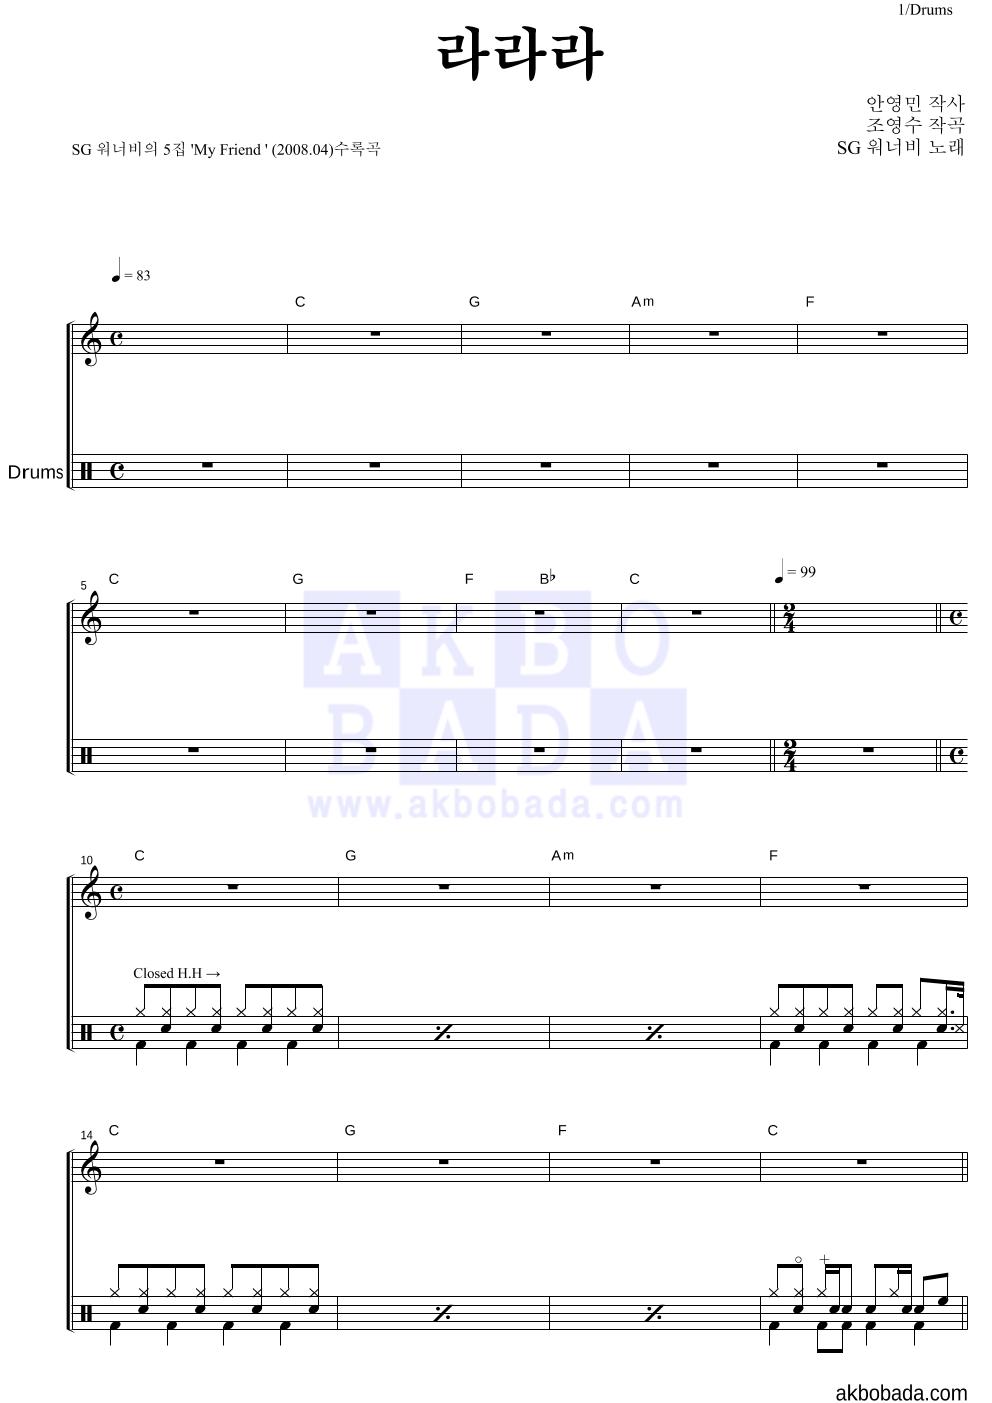 SG워너비 - 라라라 드럼 악보